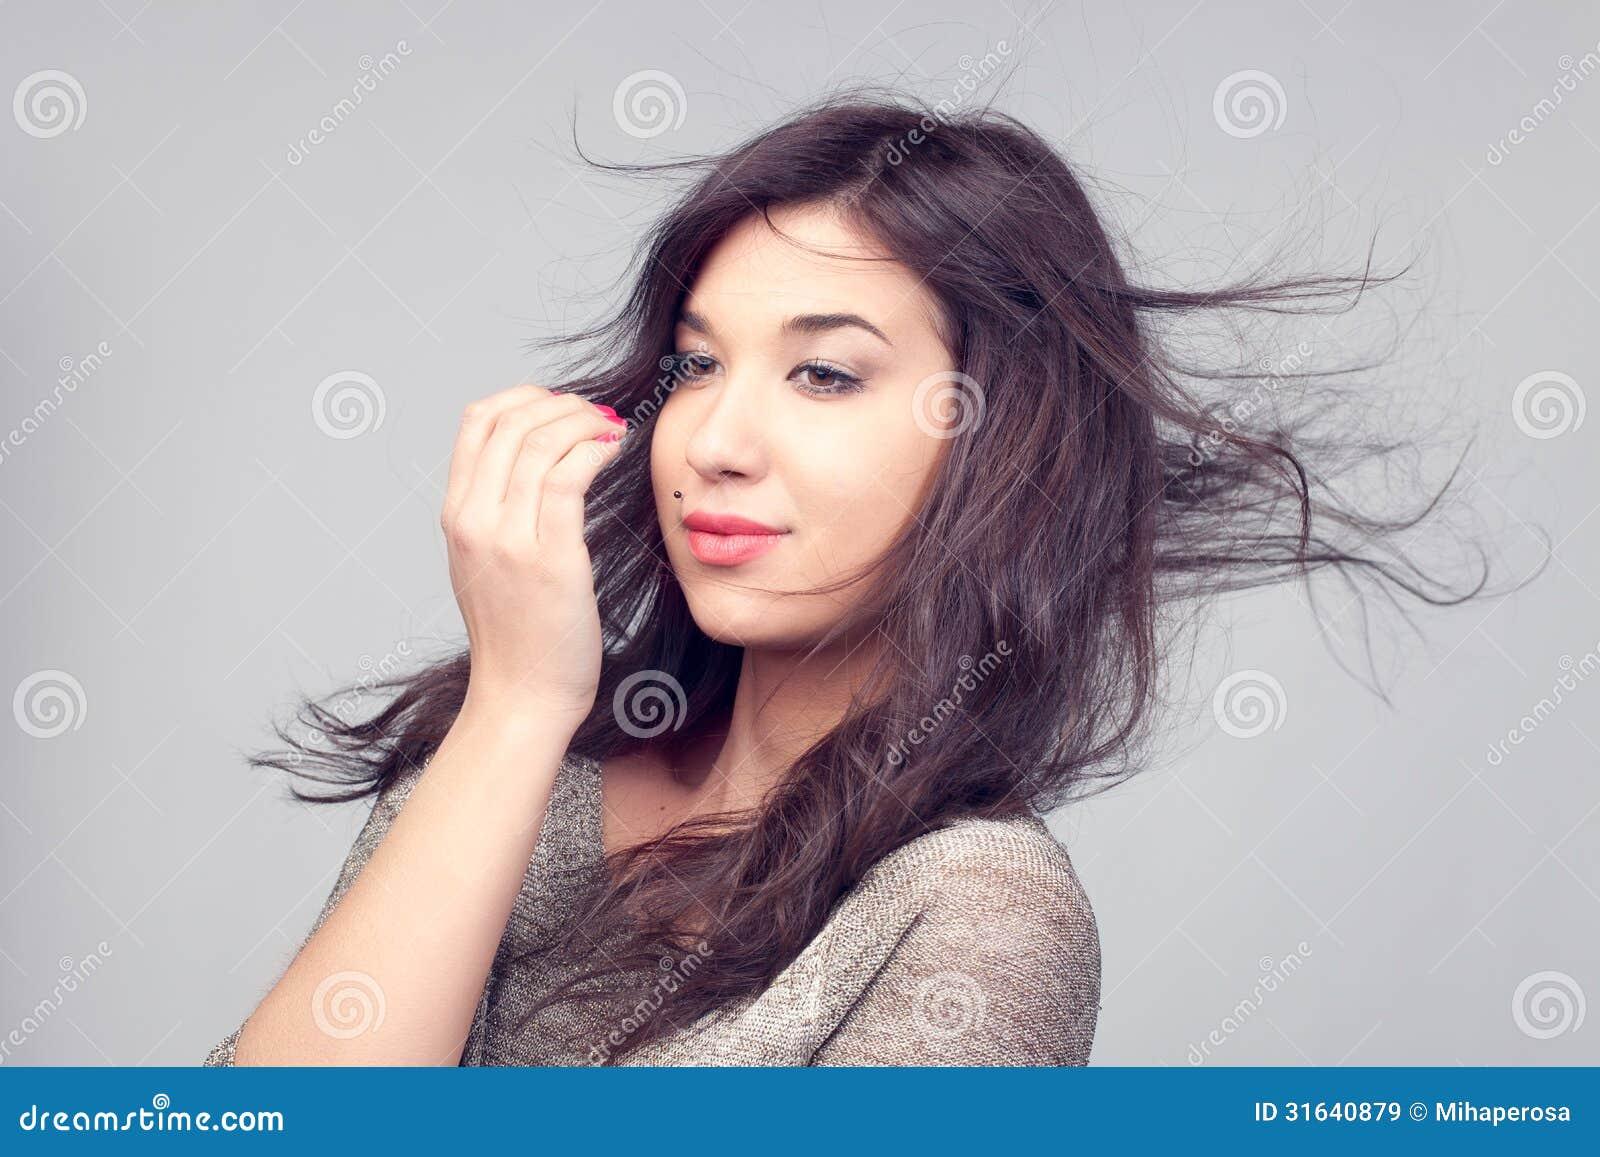 mediterranean women and wind studio shoot royalty free stock images image 31640879. Black Bedroom Furniture Sets. Home Design Ideas